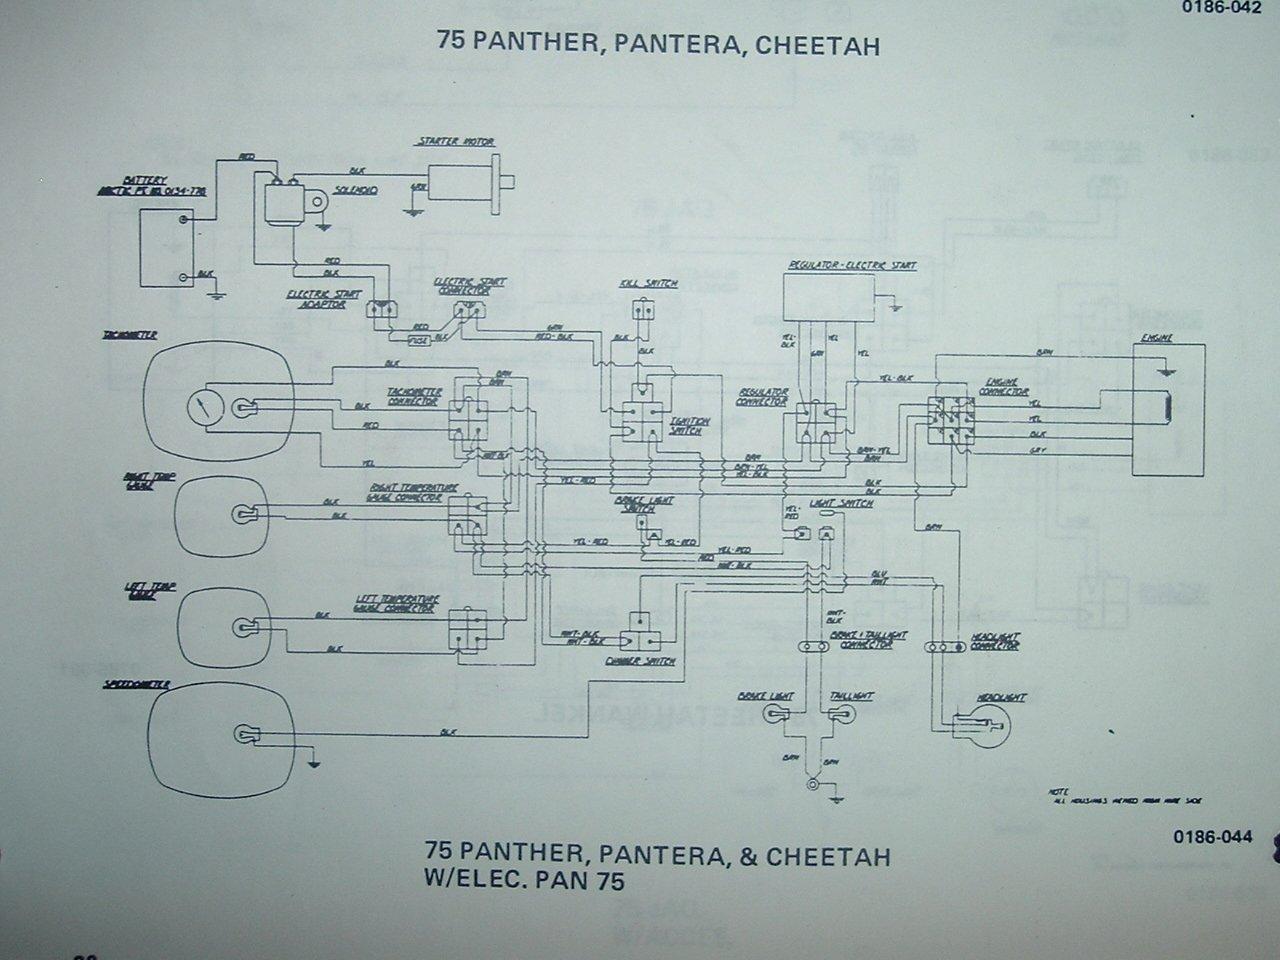 Trx200sx Cdi Diagram - House Wiring Diagram Symbols •